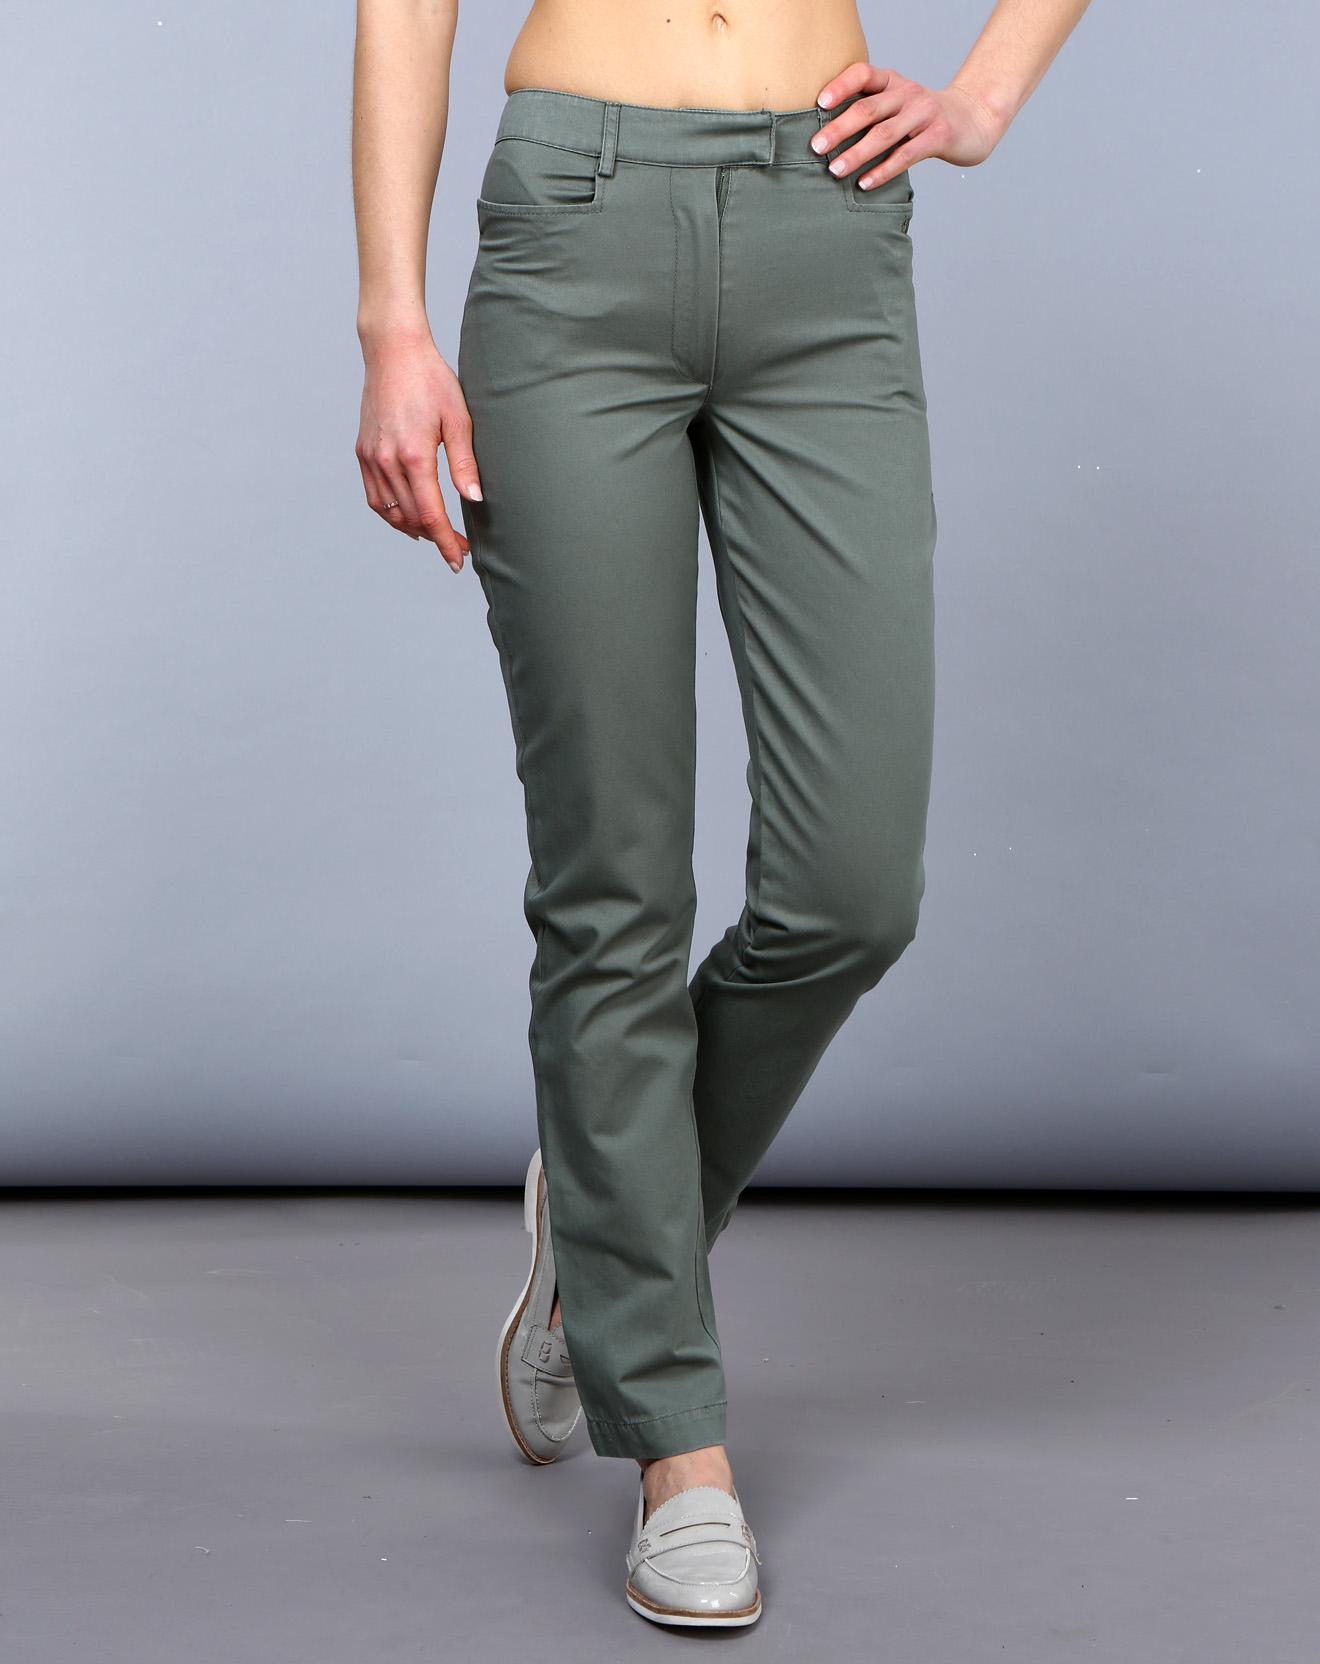 armand ventilo pantalon justine vert anglais ebay. Black Bedroom Furniture Sets. Home Design Ideas